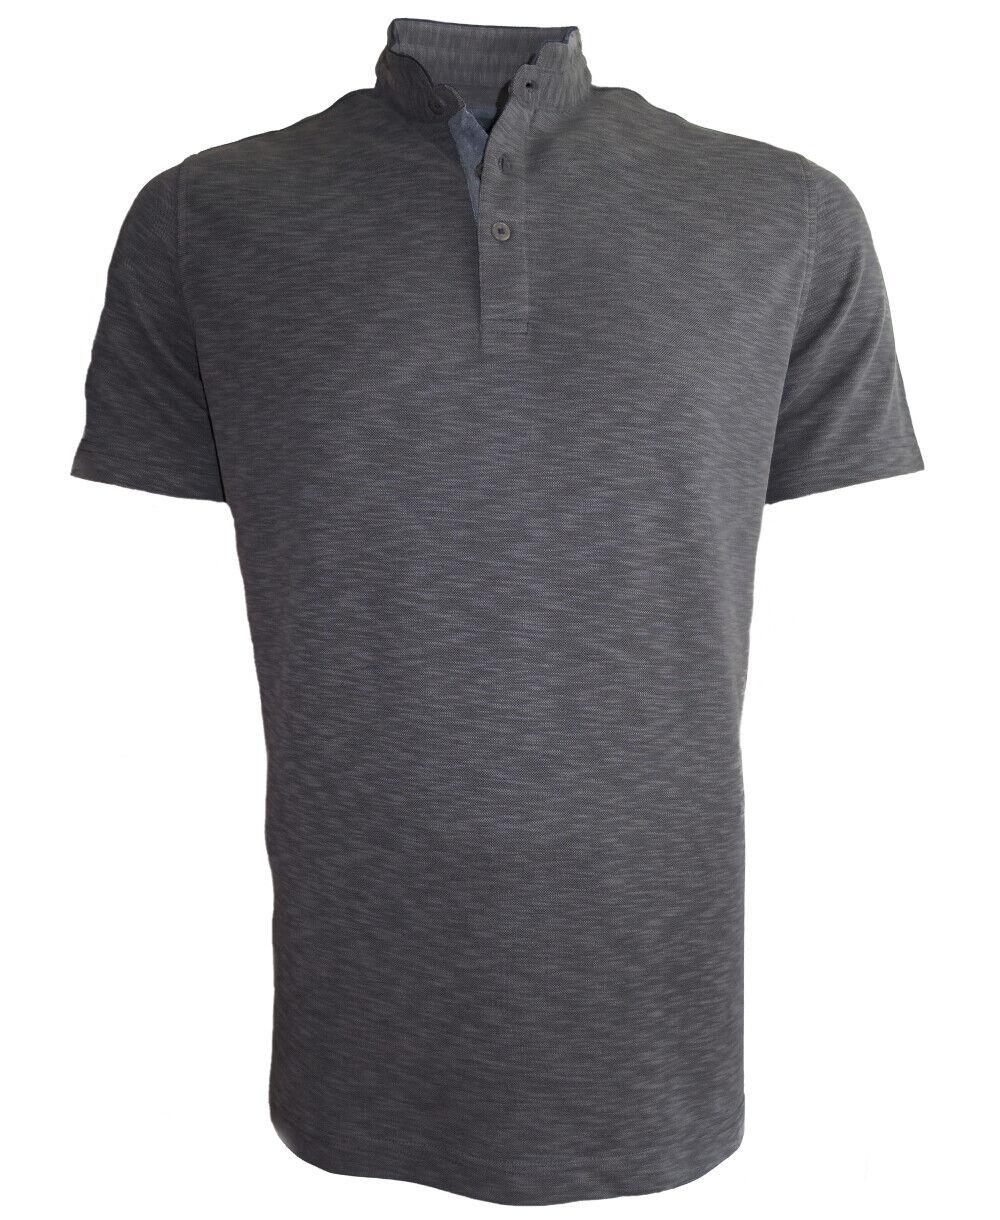 Baileys Stehkragen Kurzarm Shirt Modal dunkelgrey Melangeoptik Gr. M-6XL